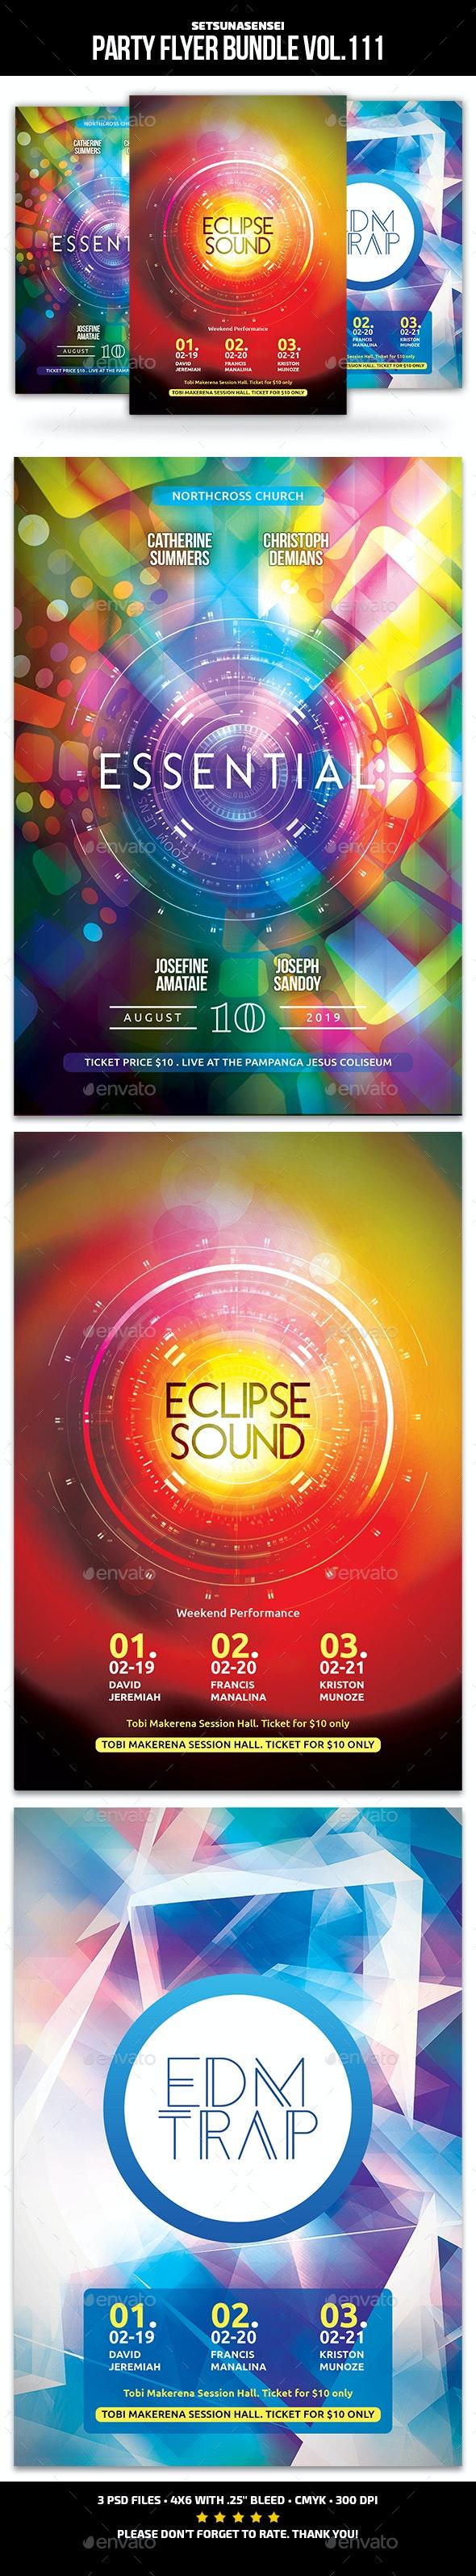 Party Flyer Bundle Vol.111 - Events Flyers